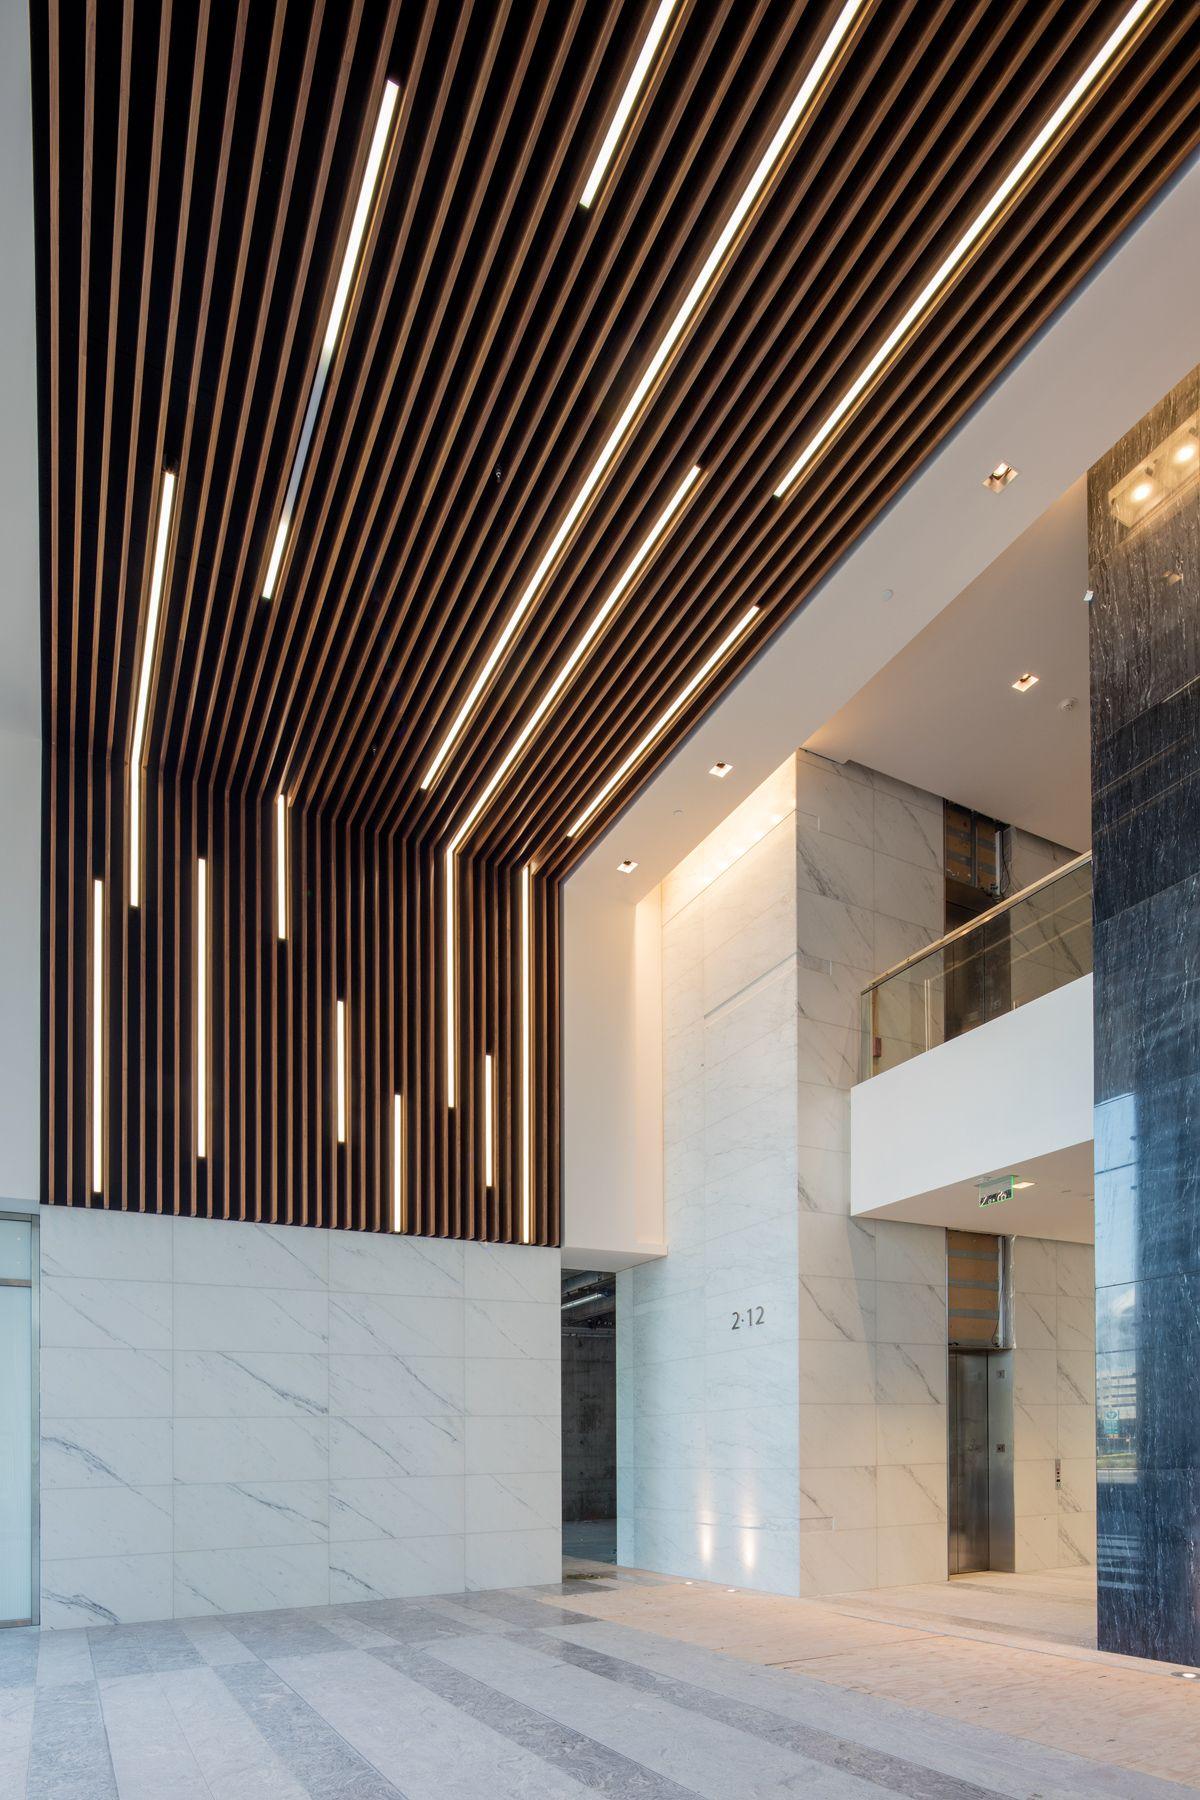 Lg Ec4hus 100f Jpg 1200 1800 Modern Office Design Wood Slat Ceiling False Ceiling Design